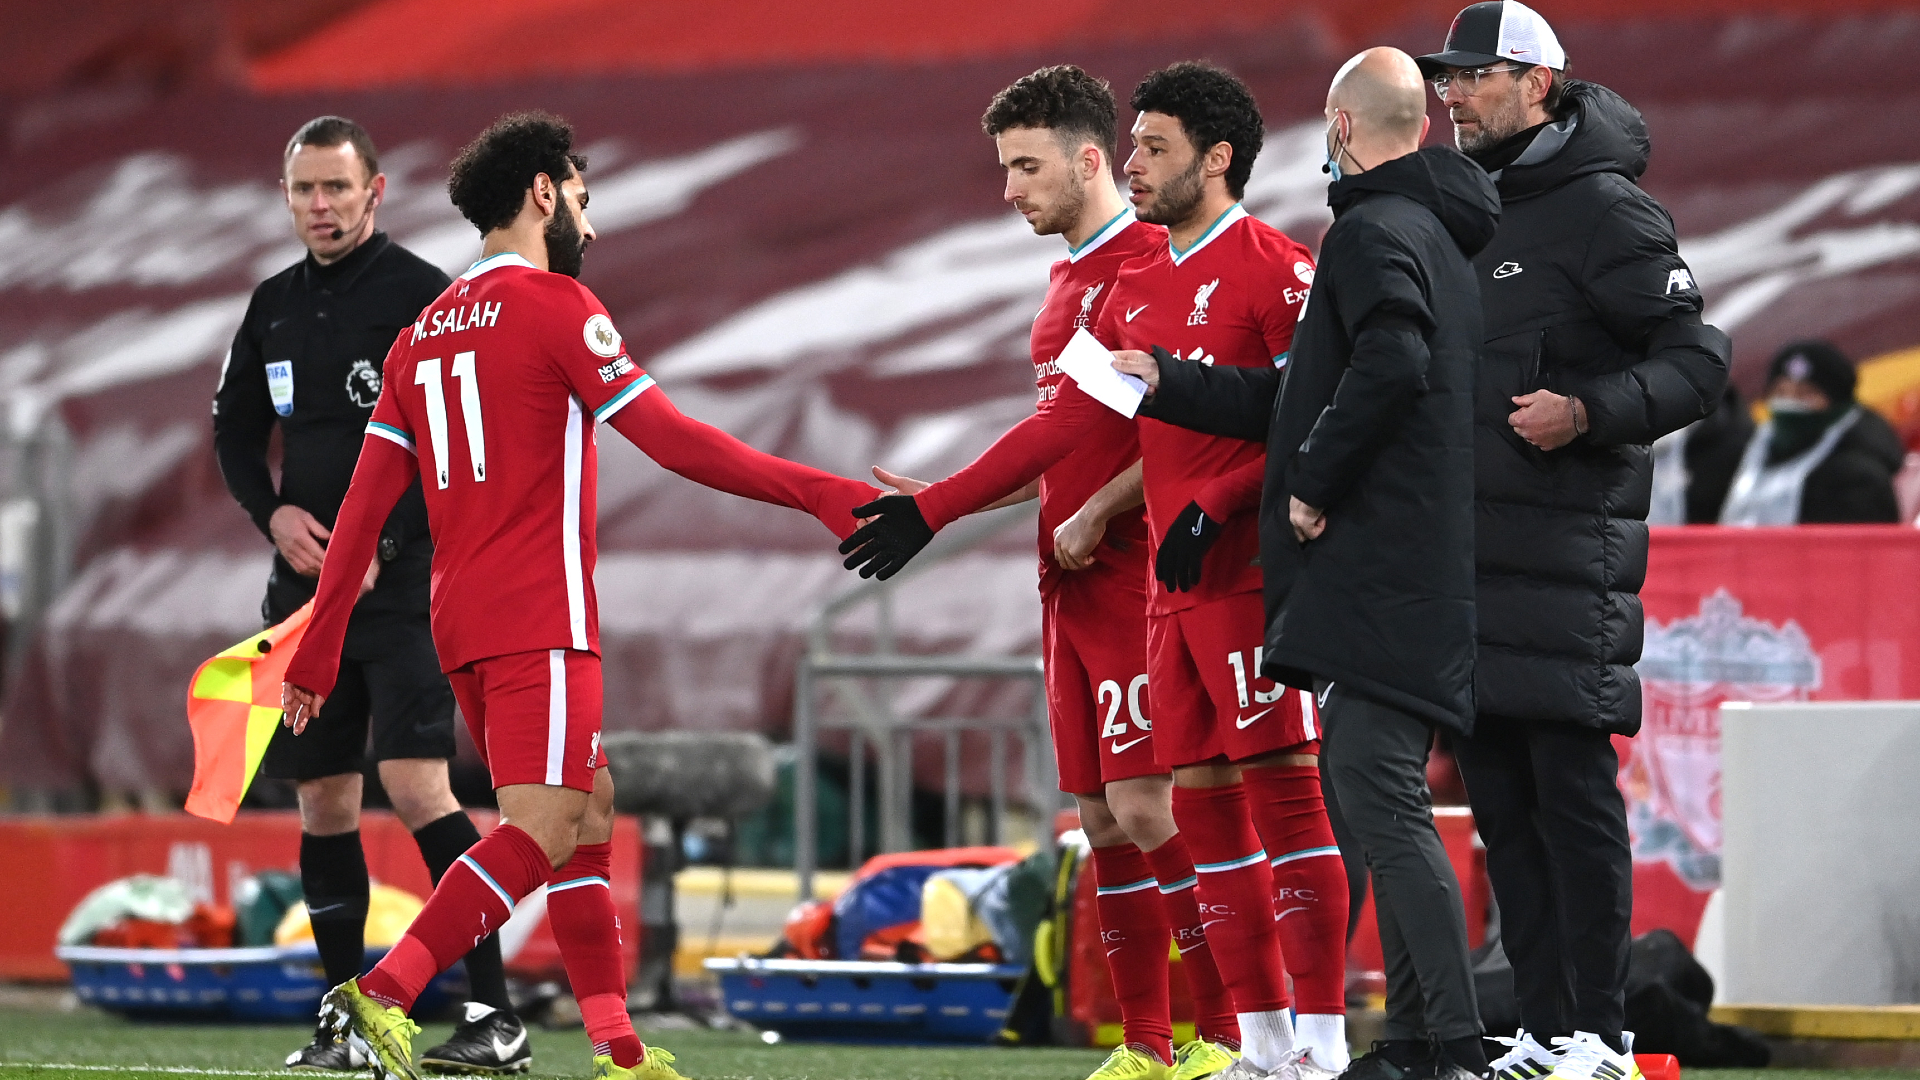 Klopp will keep talking to Salah but Liverpool boss sees no need for 'proper talk'